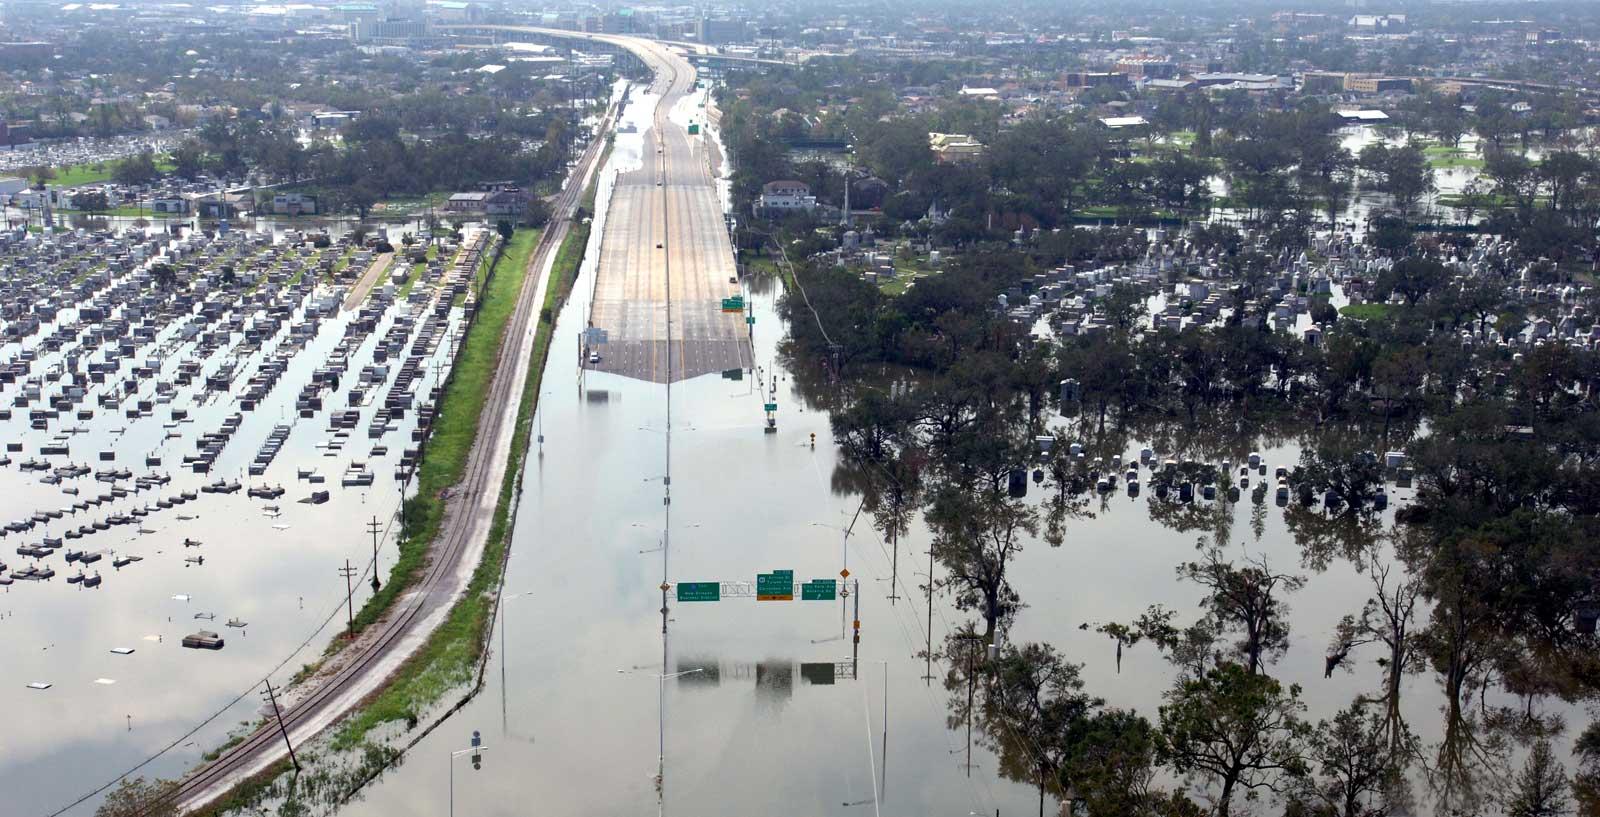 Flooded highways in New Orleans, post-Katrina. Image: Jocelyn Augustino.